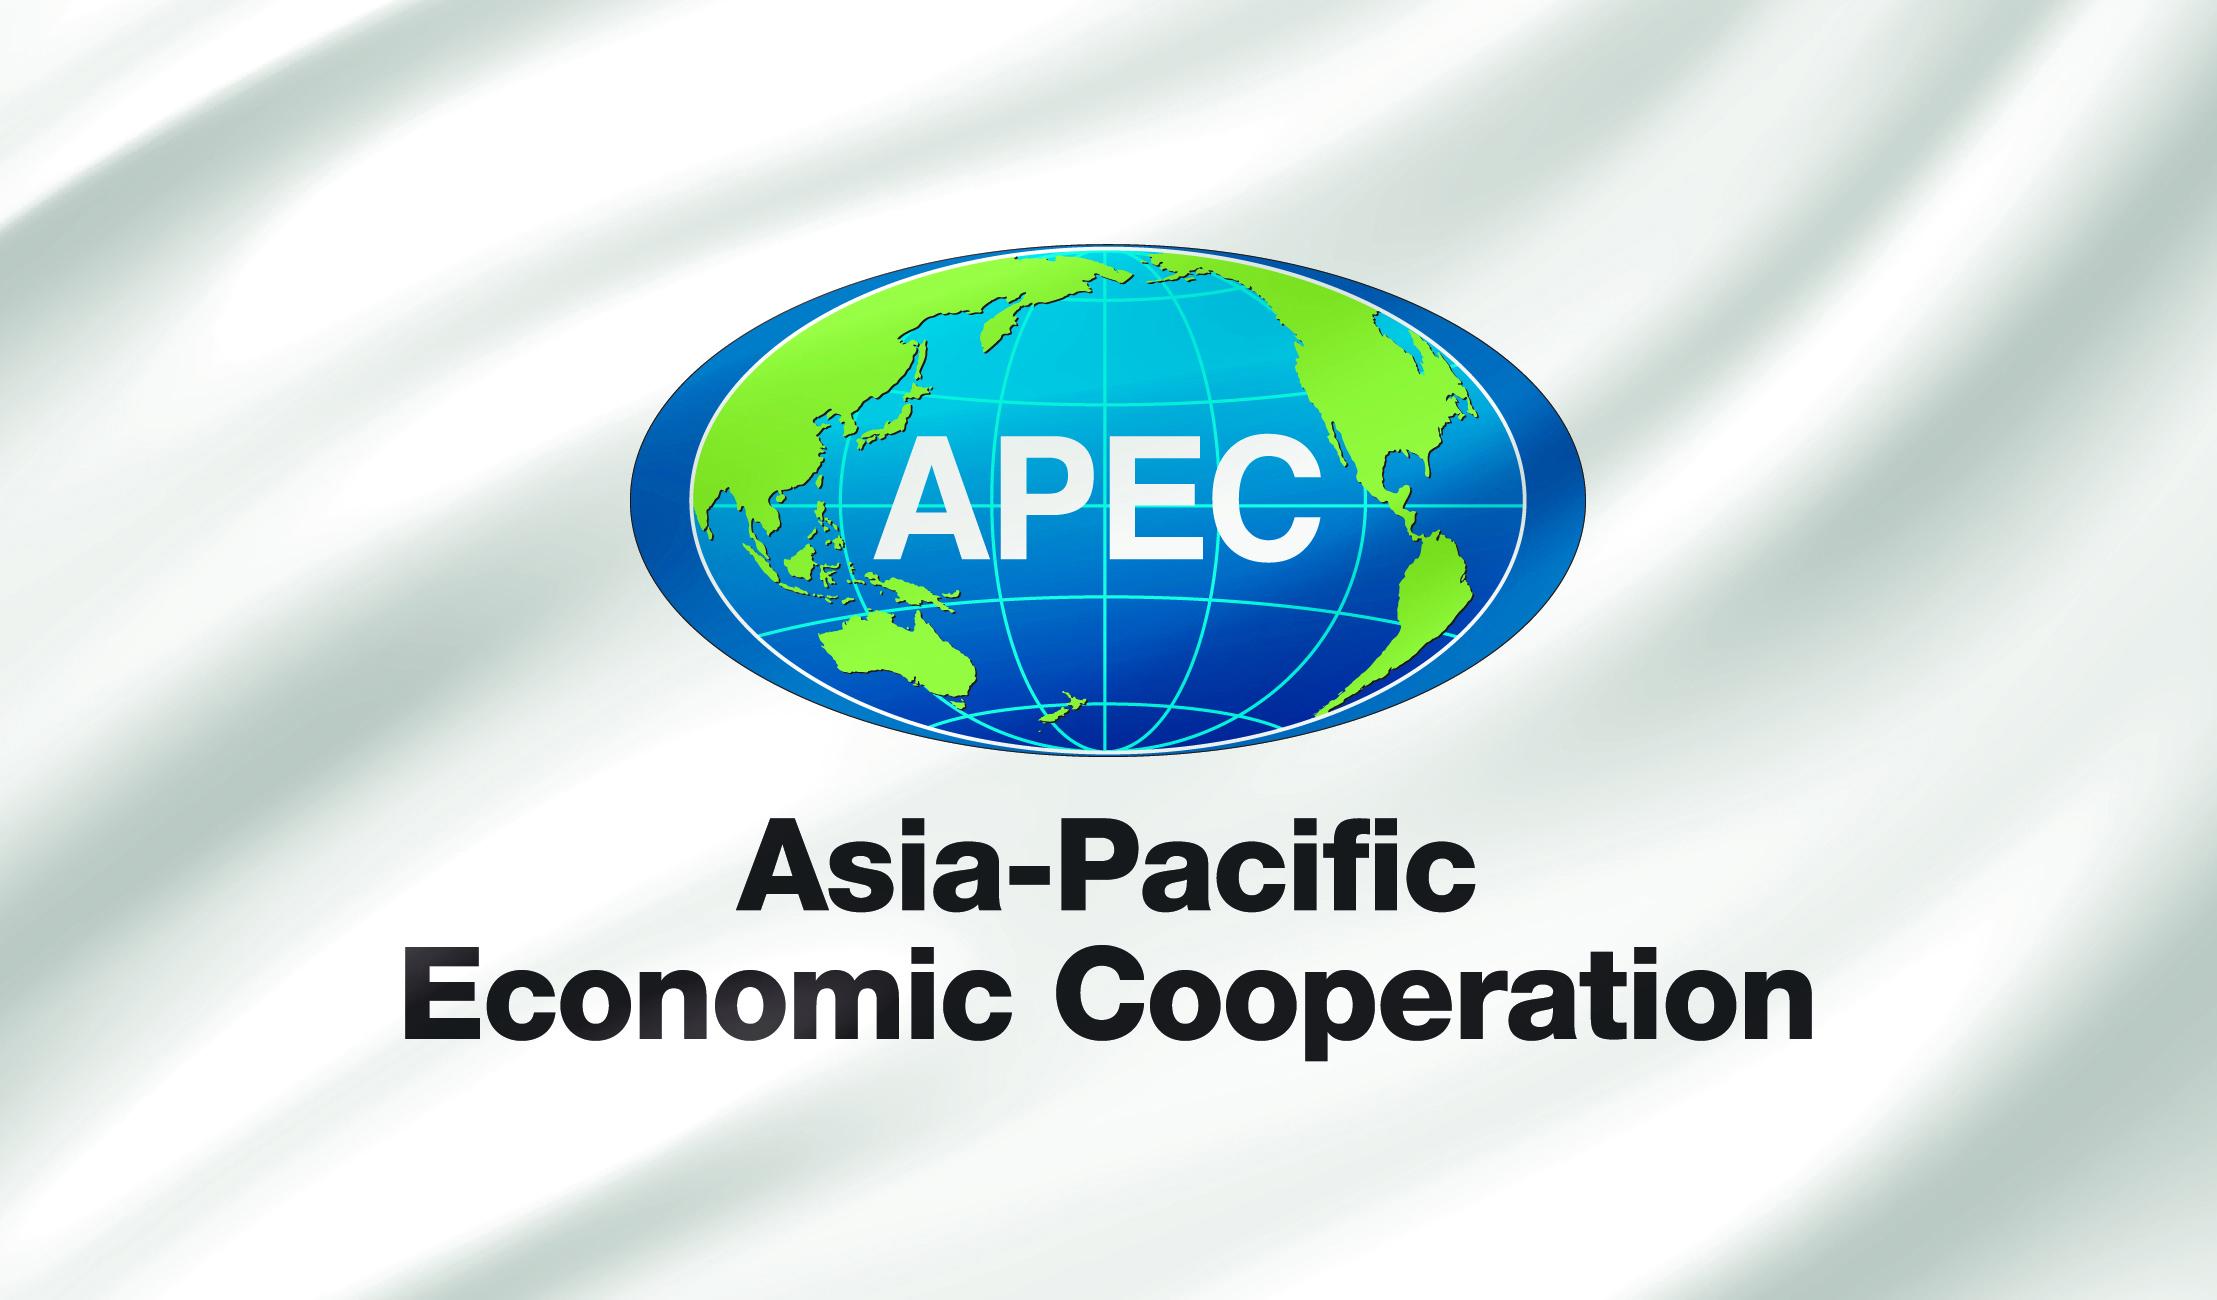 Emblem of APEC, Business Travel Card holders